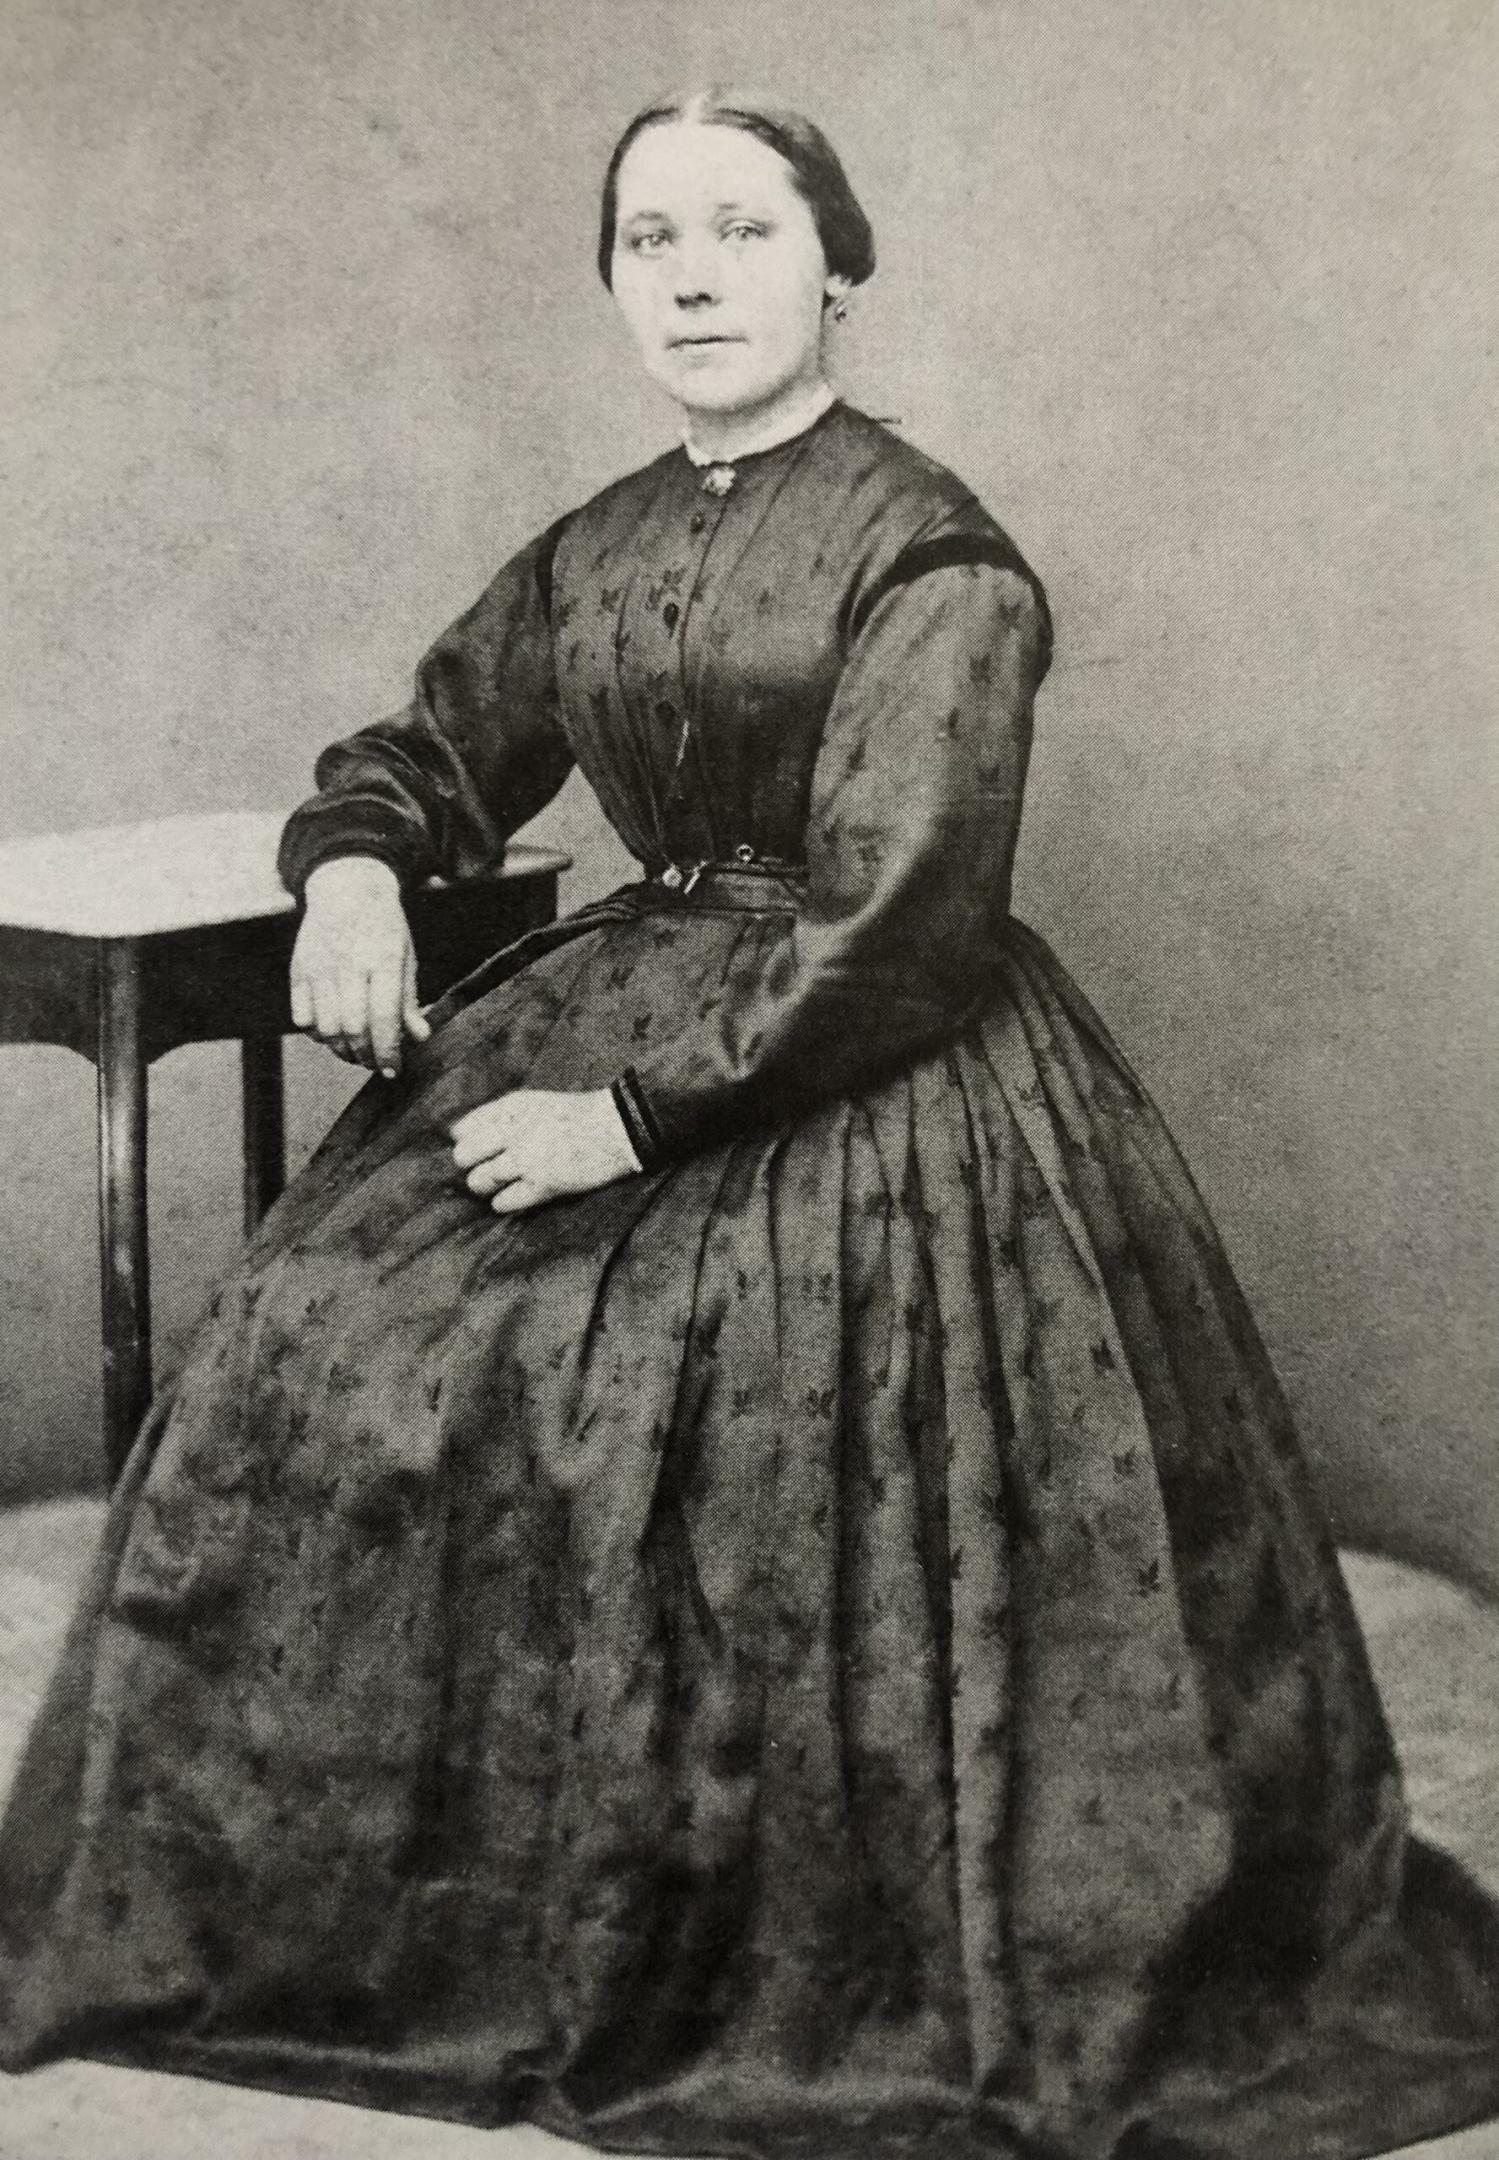 Johanne Lundby Lauridsen - senere Villemoes